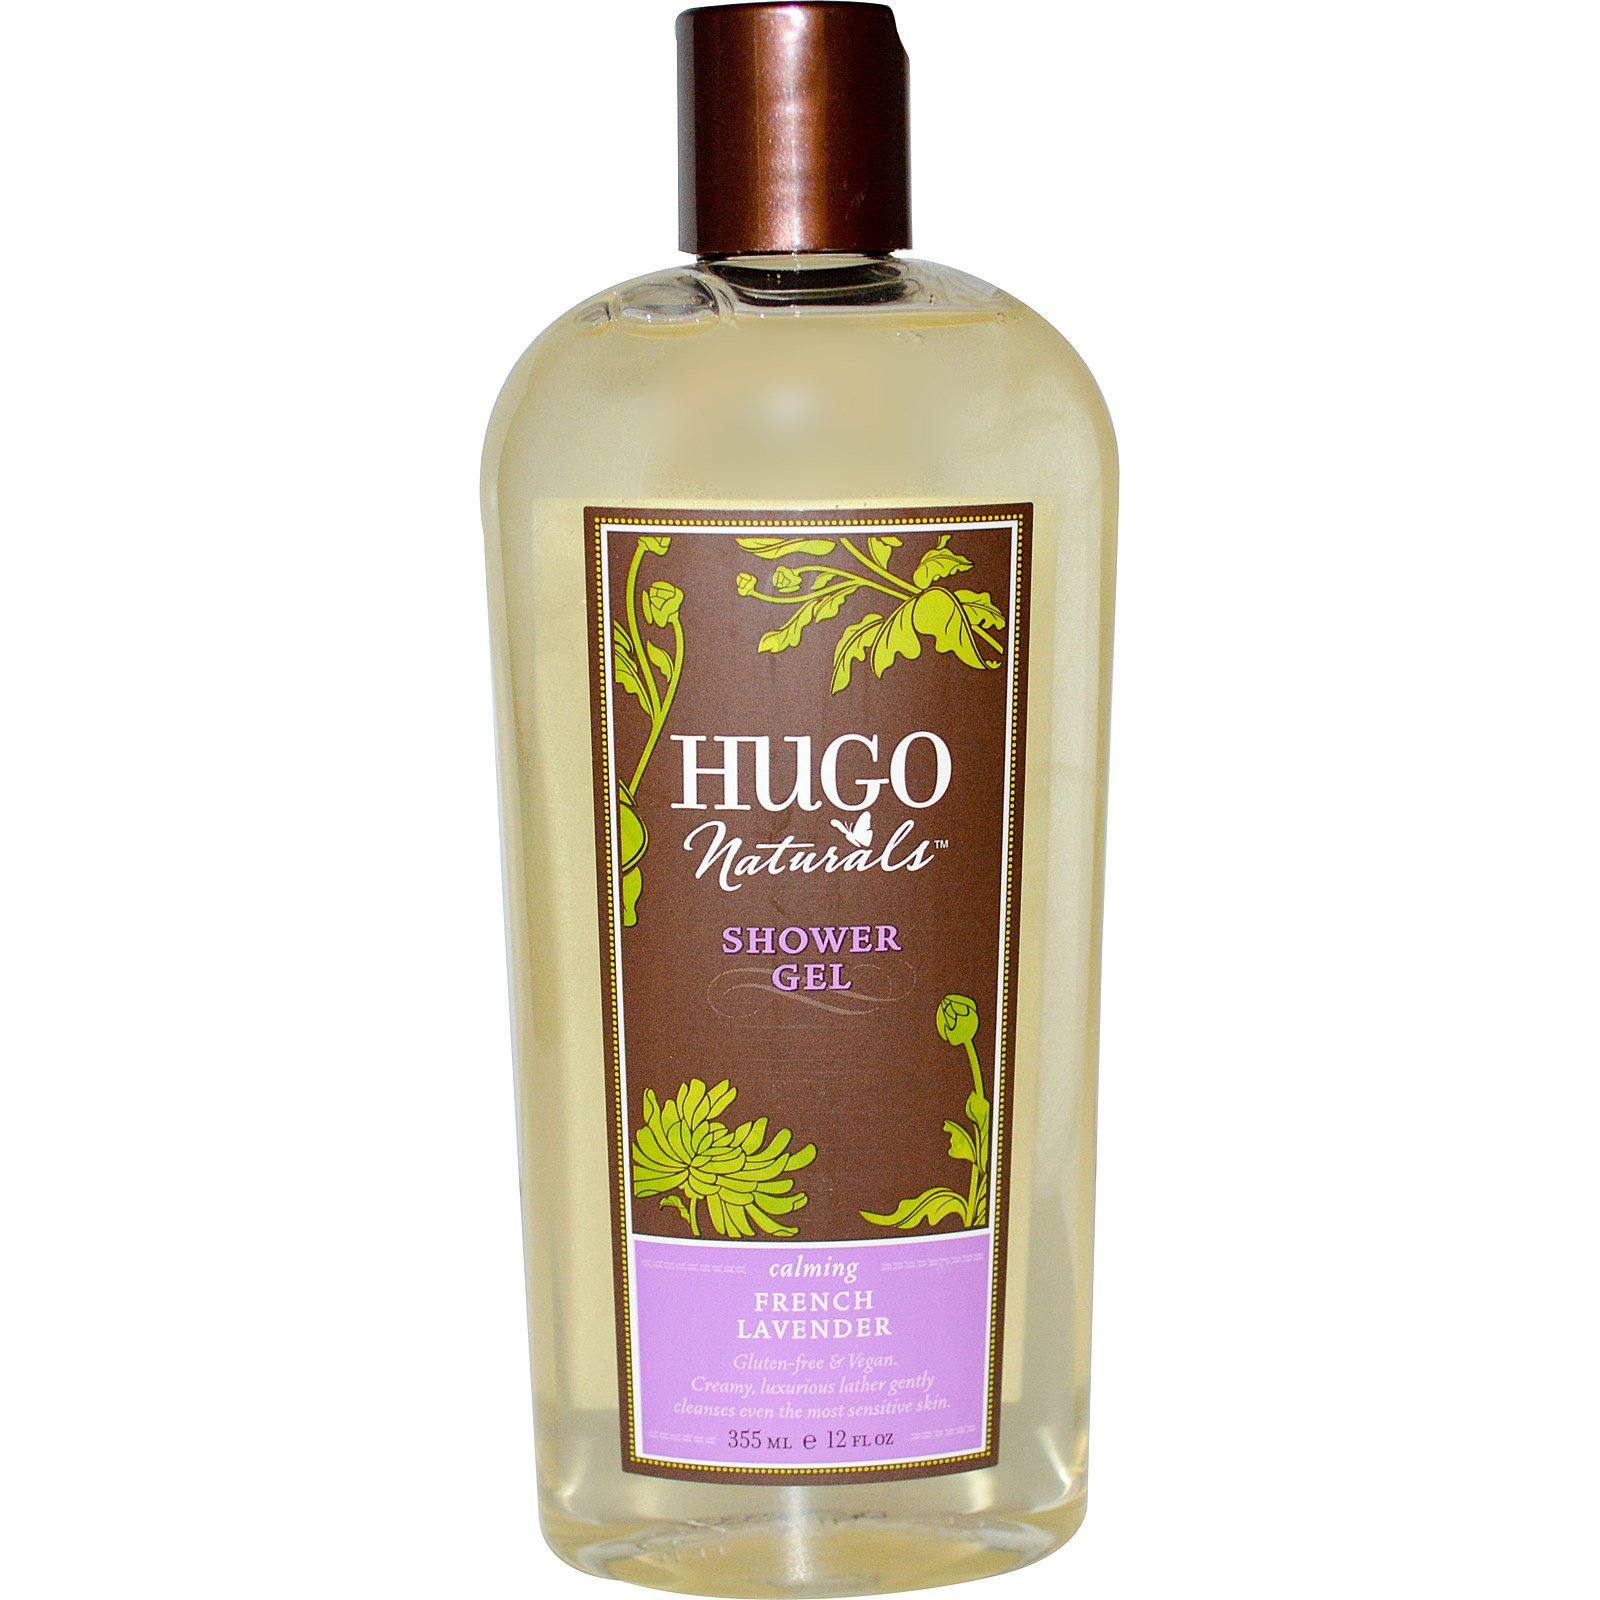 Hugo Naturals, Гель для душа, французская лаванда, 16 жидк. унц. (473 мл)